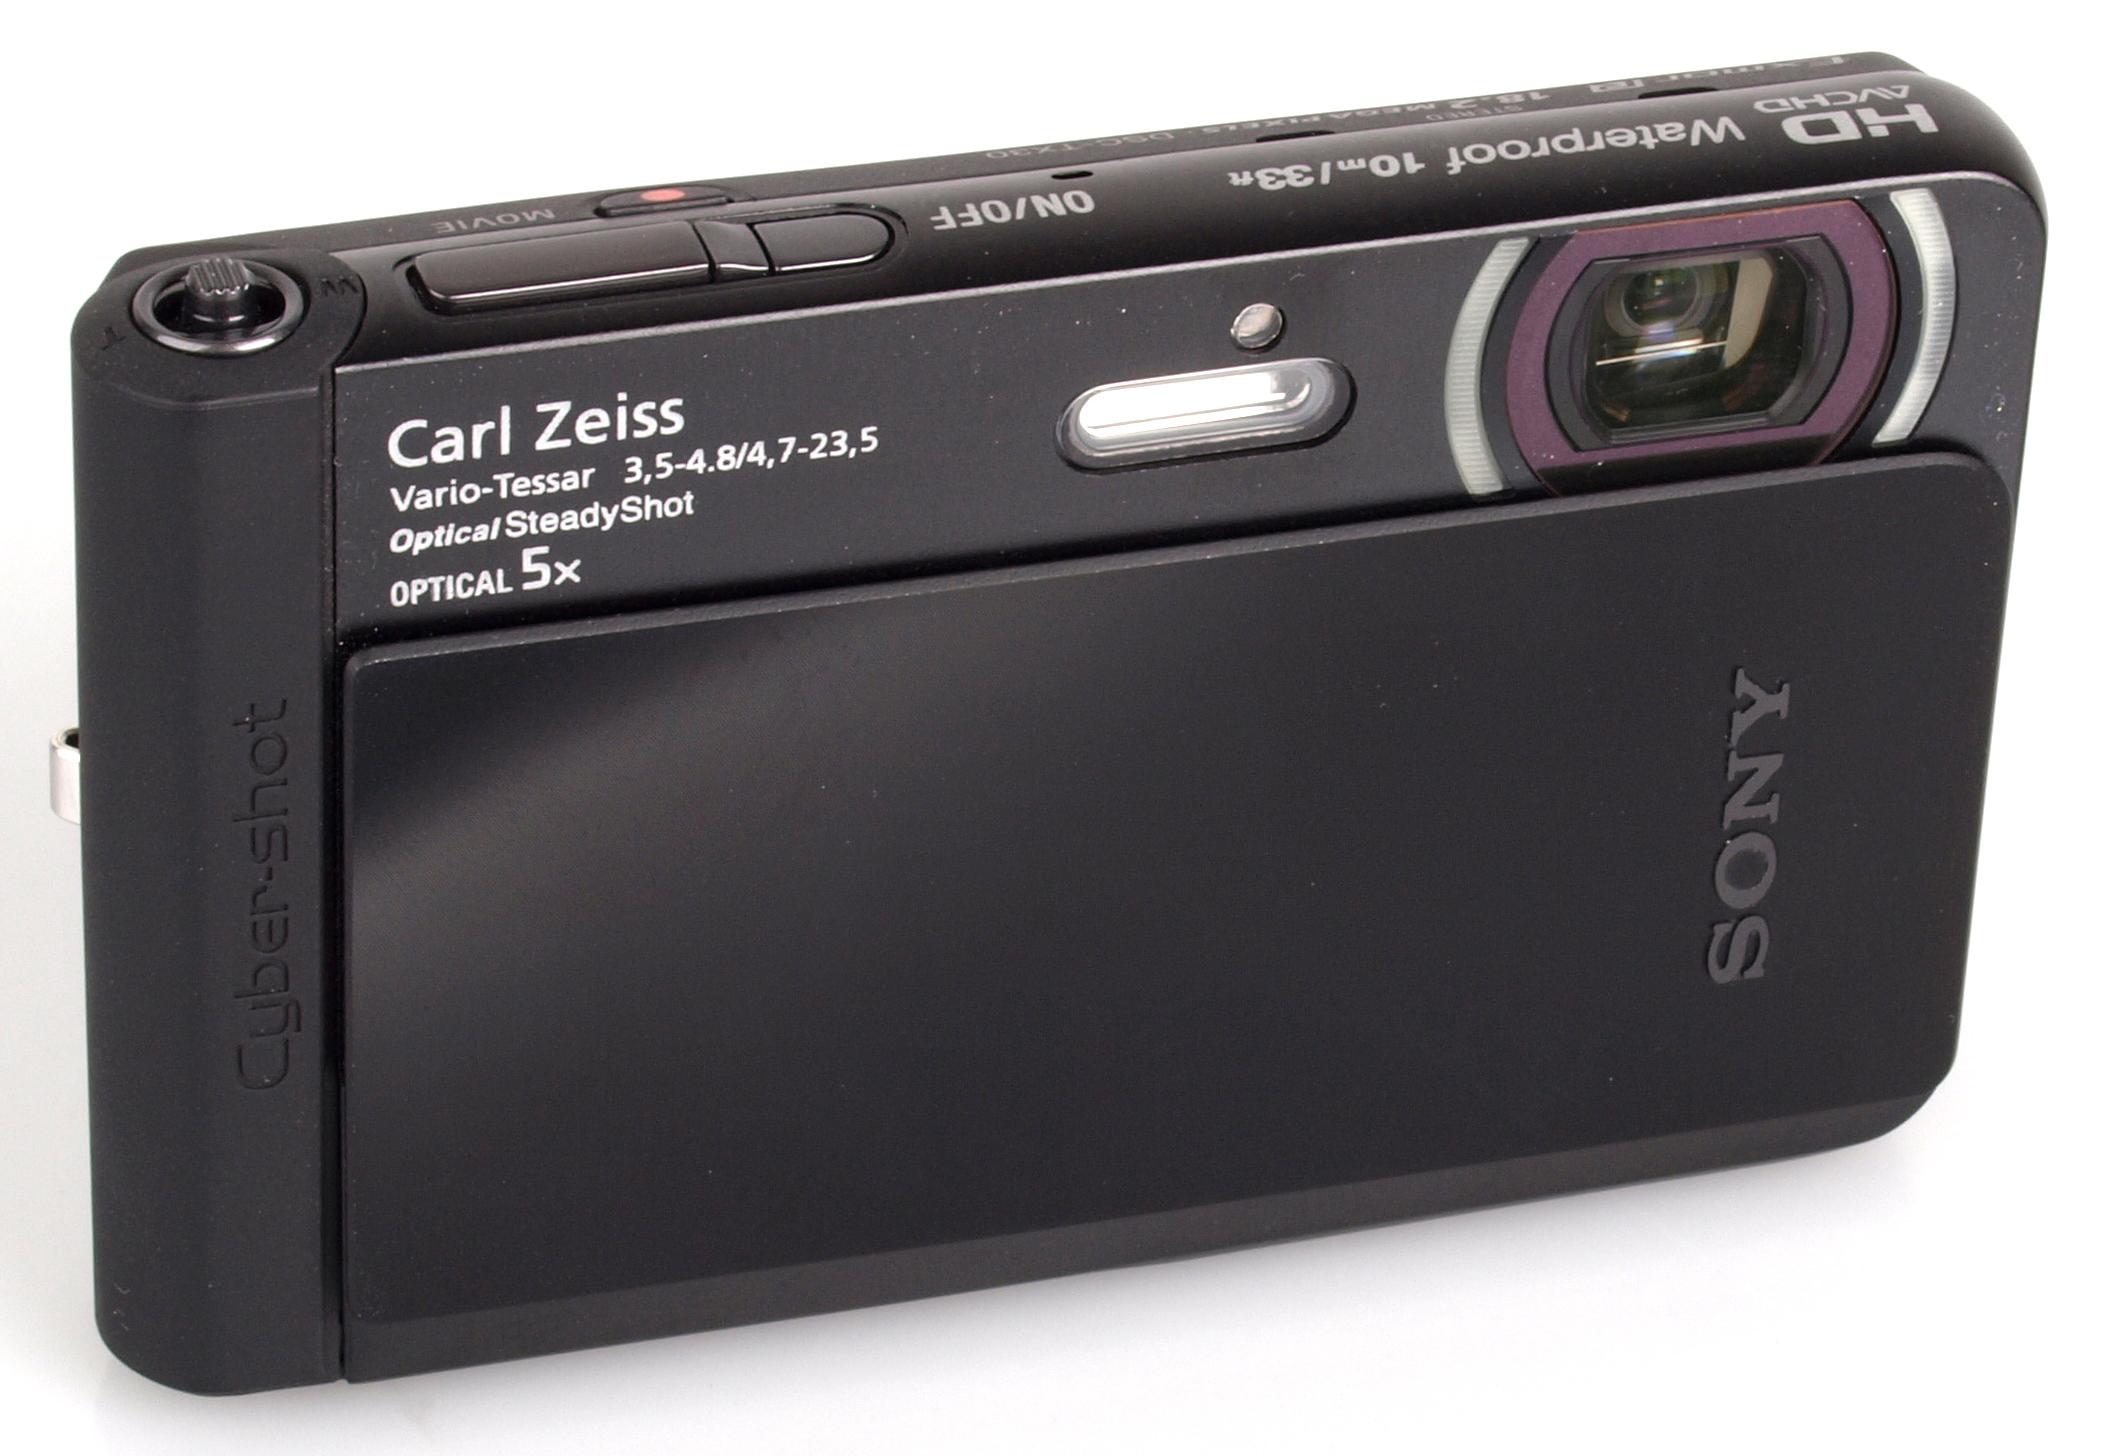 Sony Cybershot DSC-TX30 Review   ePHOTOzine